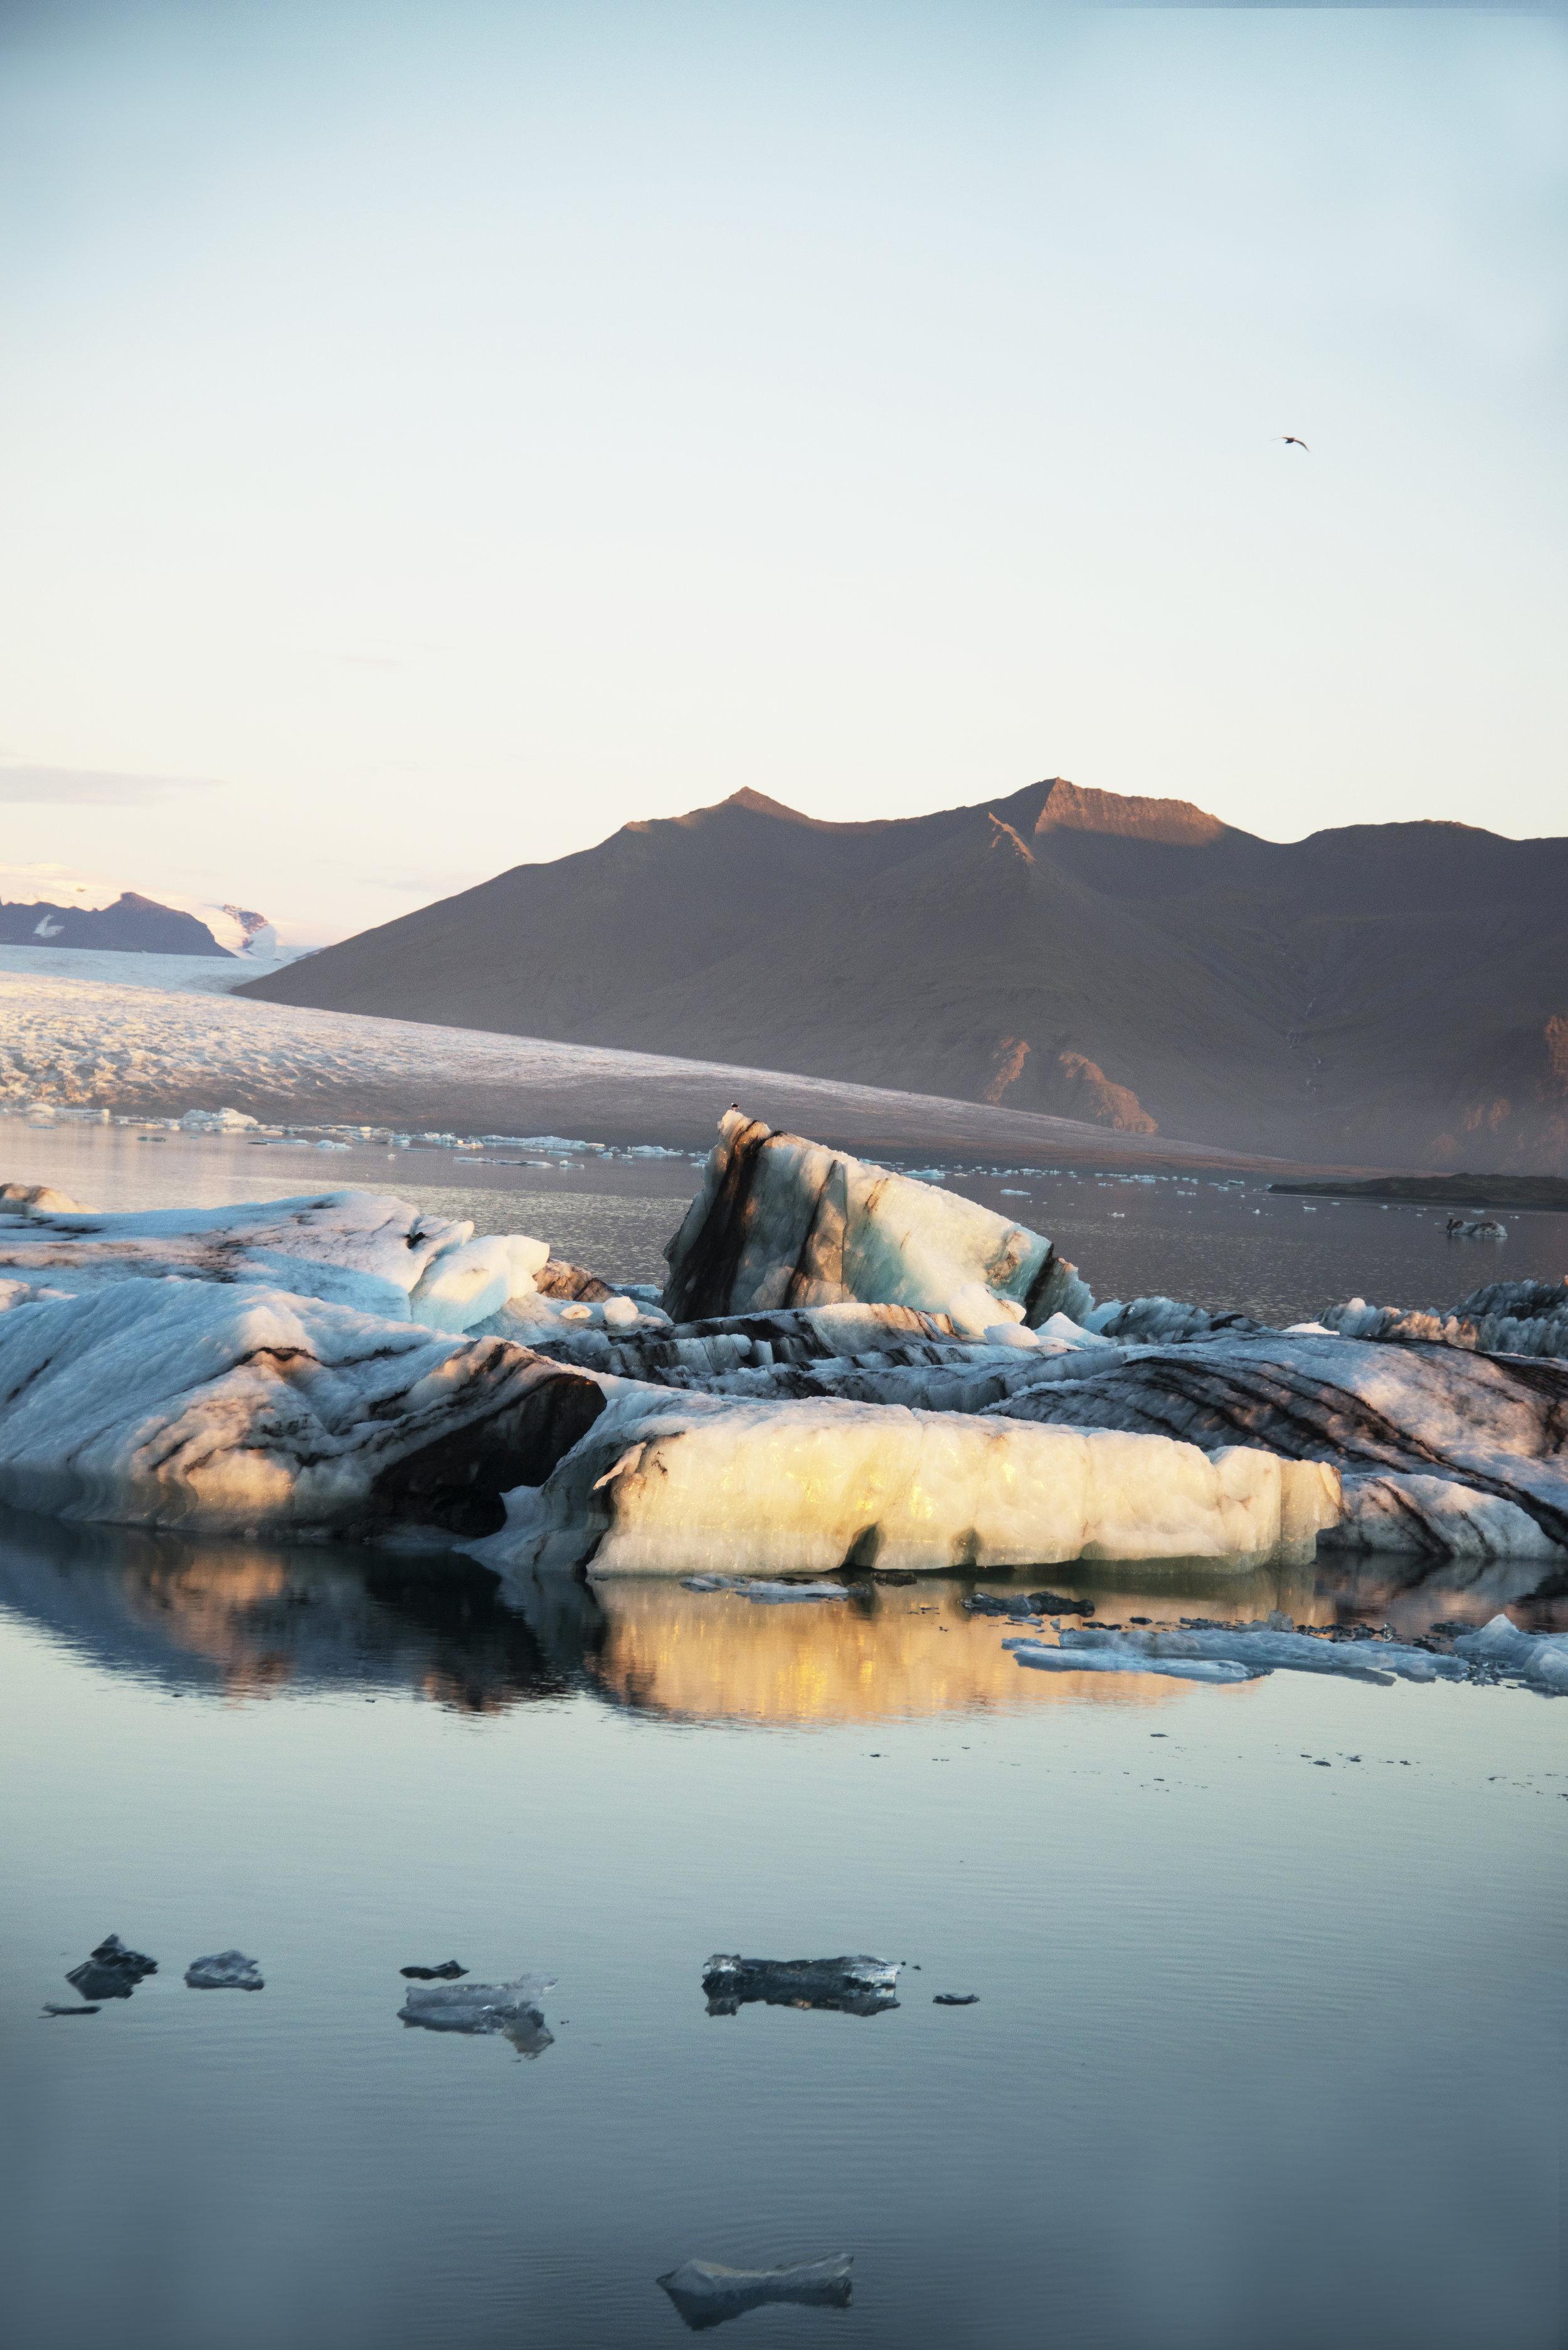 Sunrise at Jukosarlon Glacier Lagoon in Iceland.jpg